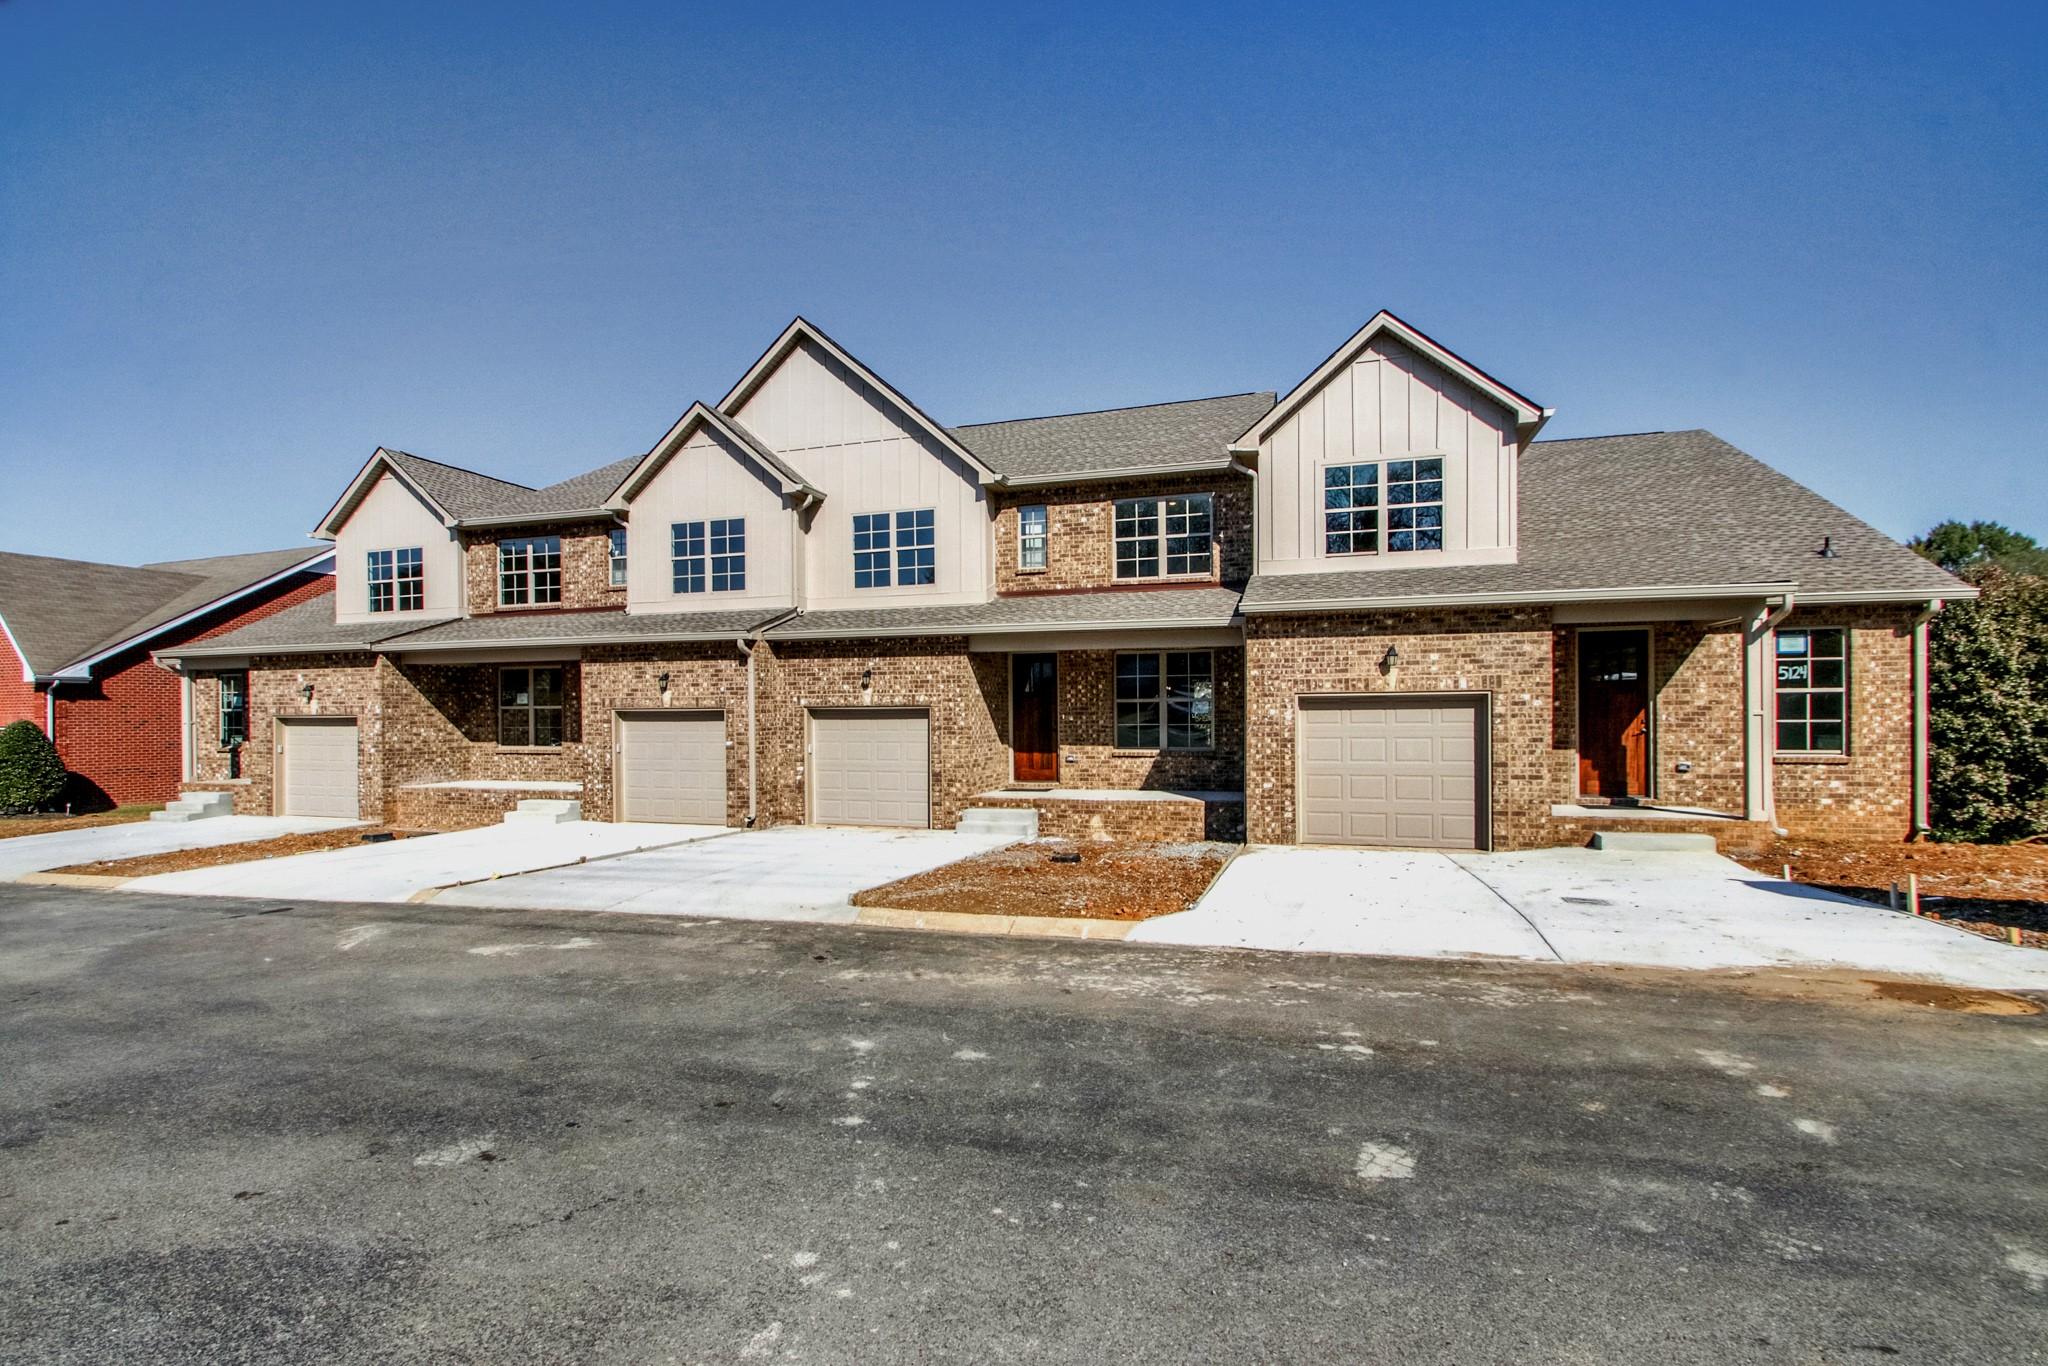 5126 Southfork Blvd, Old Hickory, TN 37138 - Old Hickory, TN real estate listing